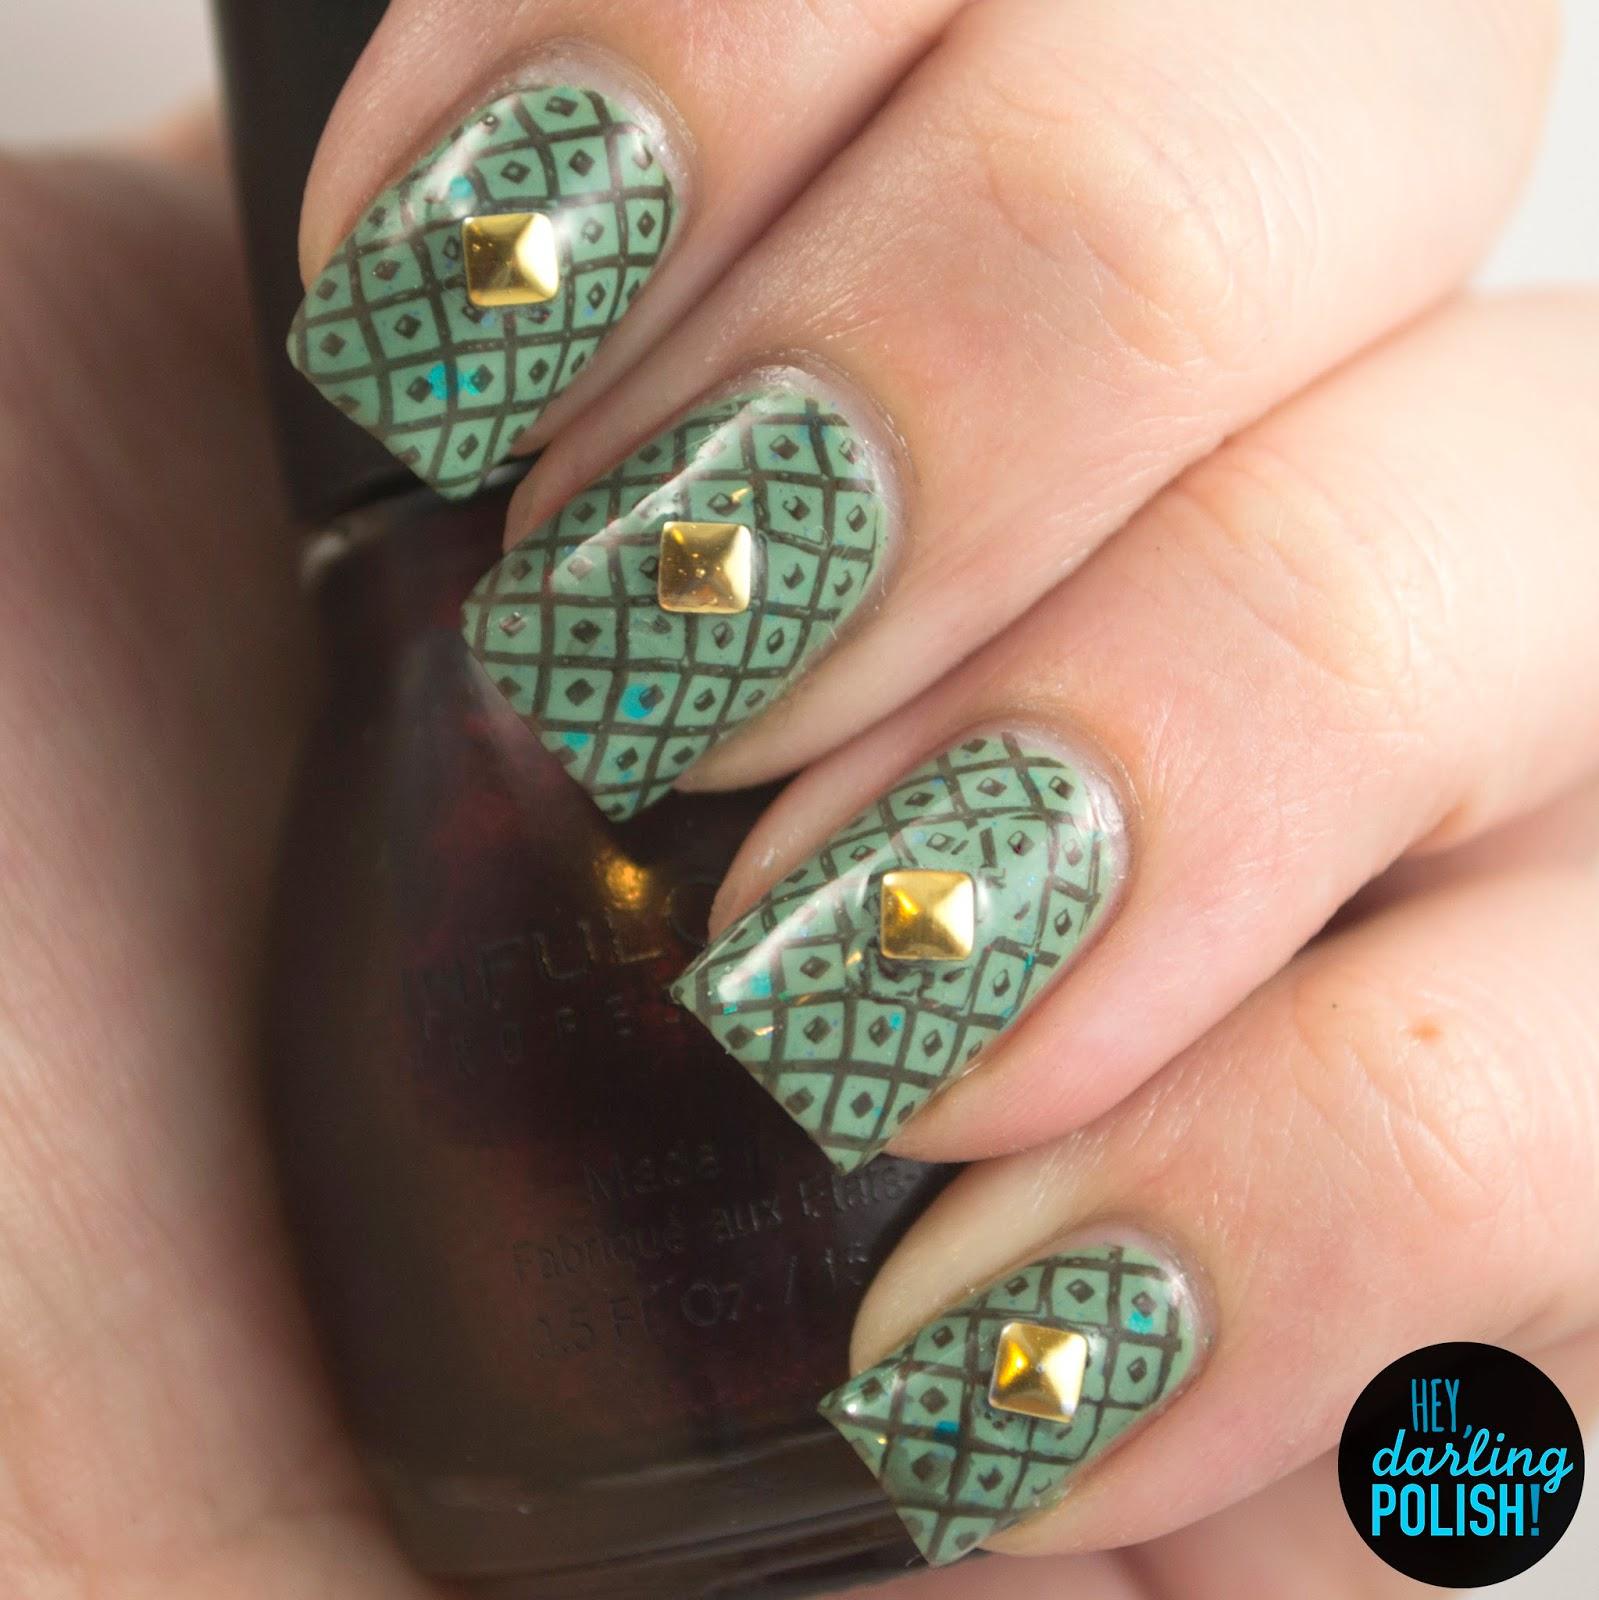 nails, nail art, nail polish, indie, indie nail polish, indie polish, green, stamping, gold, studs, the never ending pile challenge, tgpnpc, hey darling polish